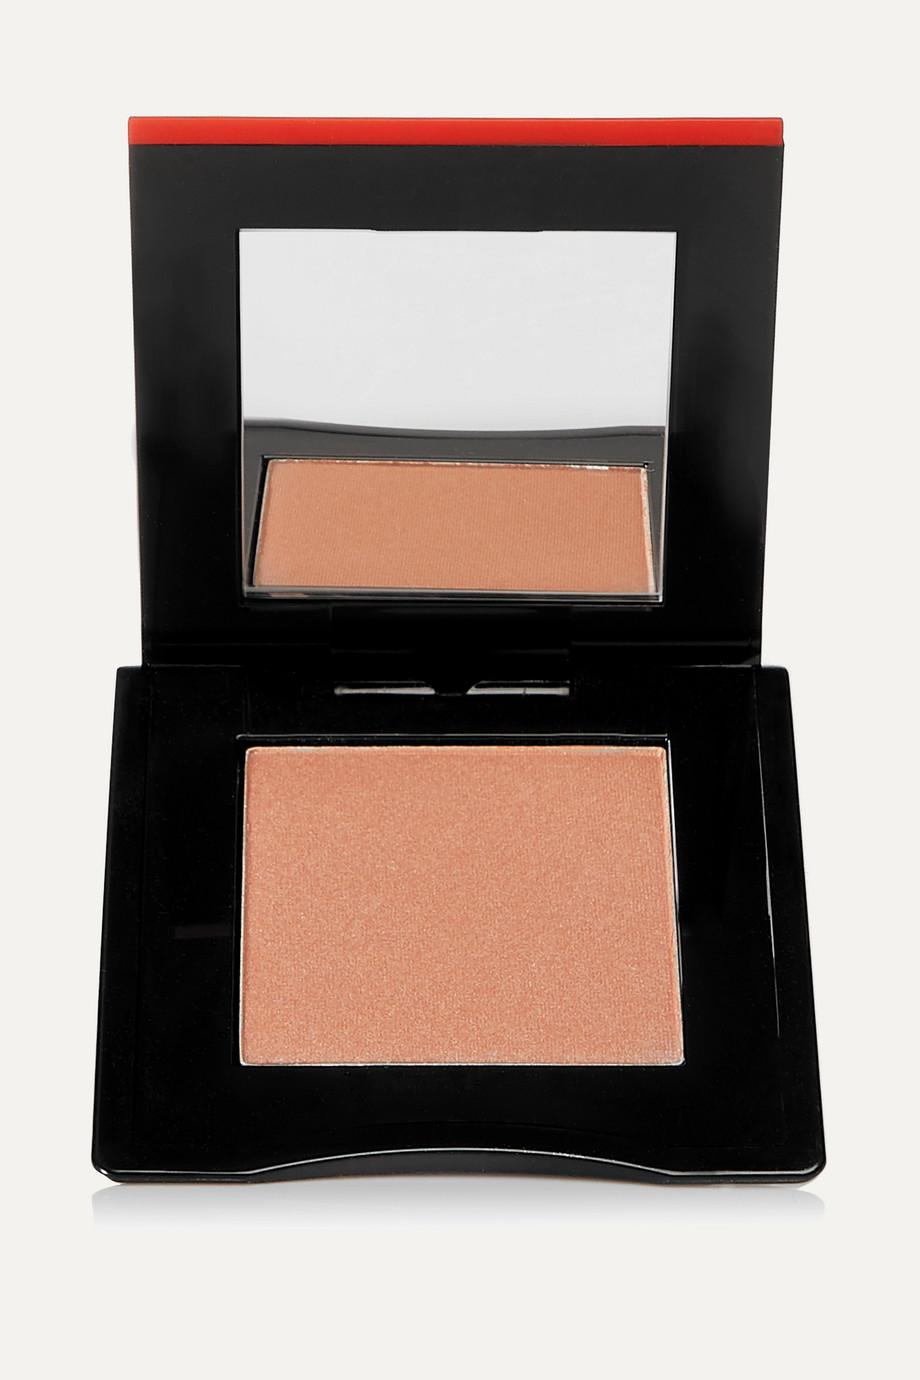 Shiseido InnerGlow CheekPowder – Solar Haze 05 – Rouge